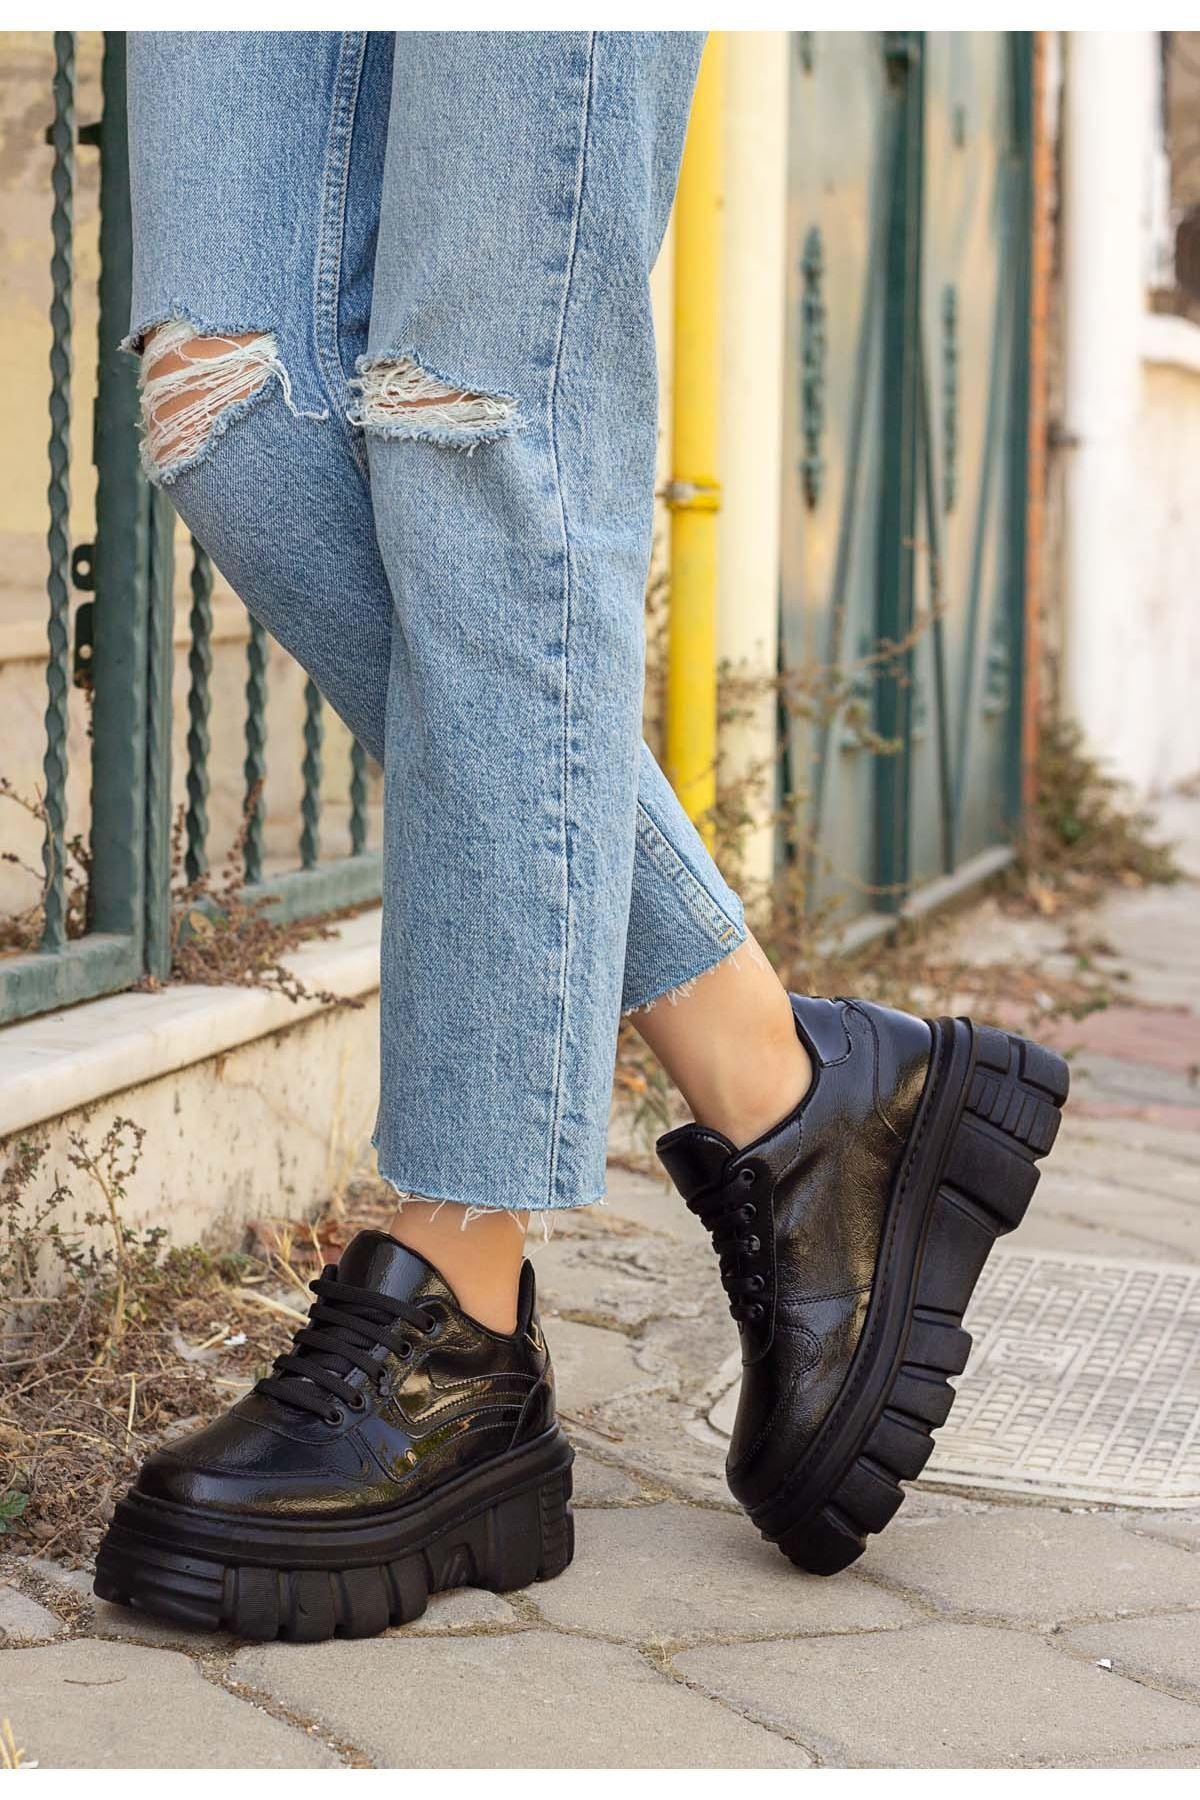 Matti Siyah Rugan Siyah Tabanlı Spor Ayakkabı